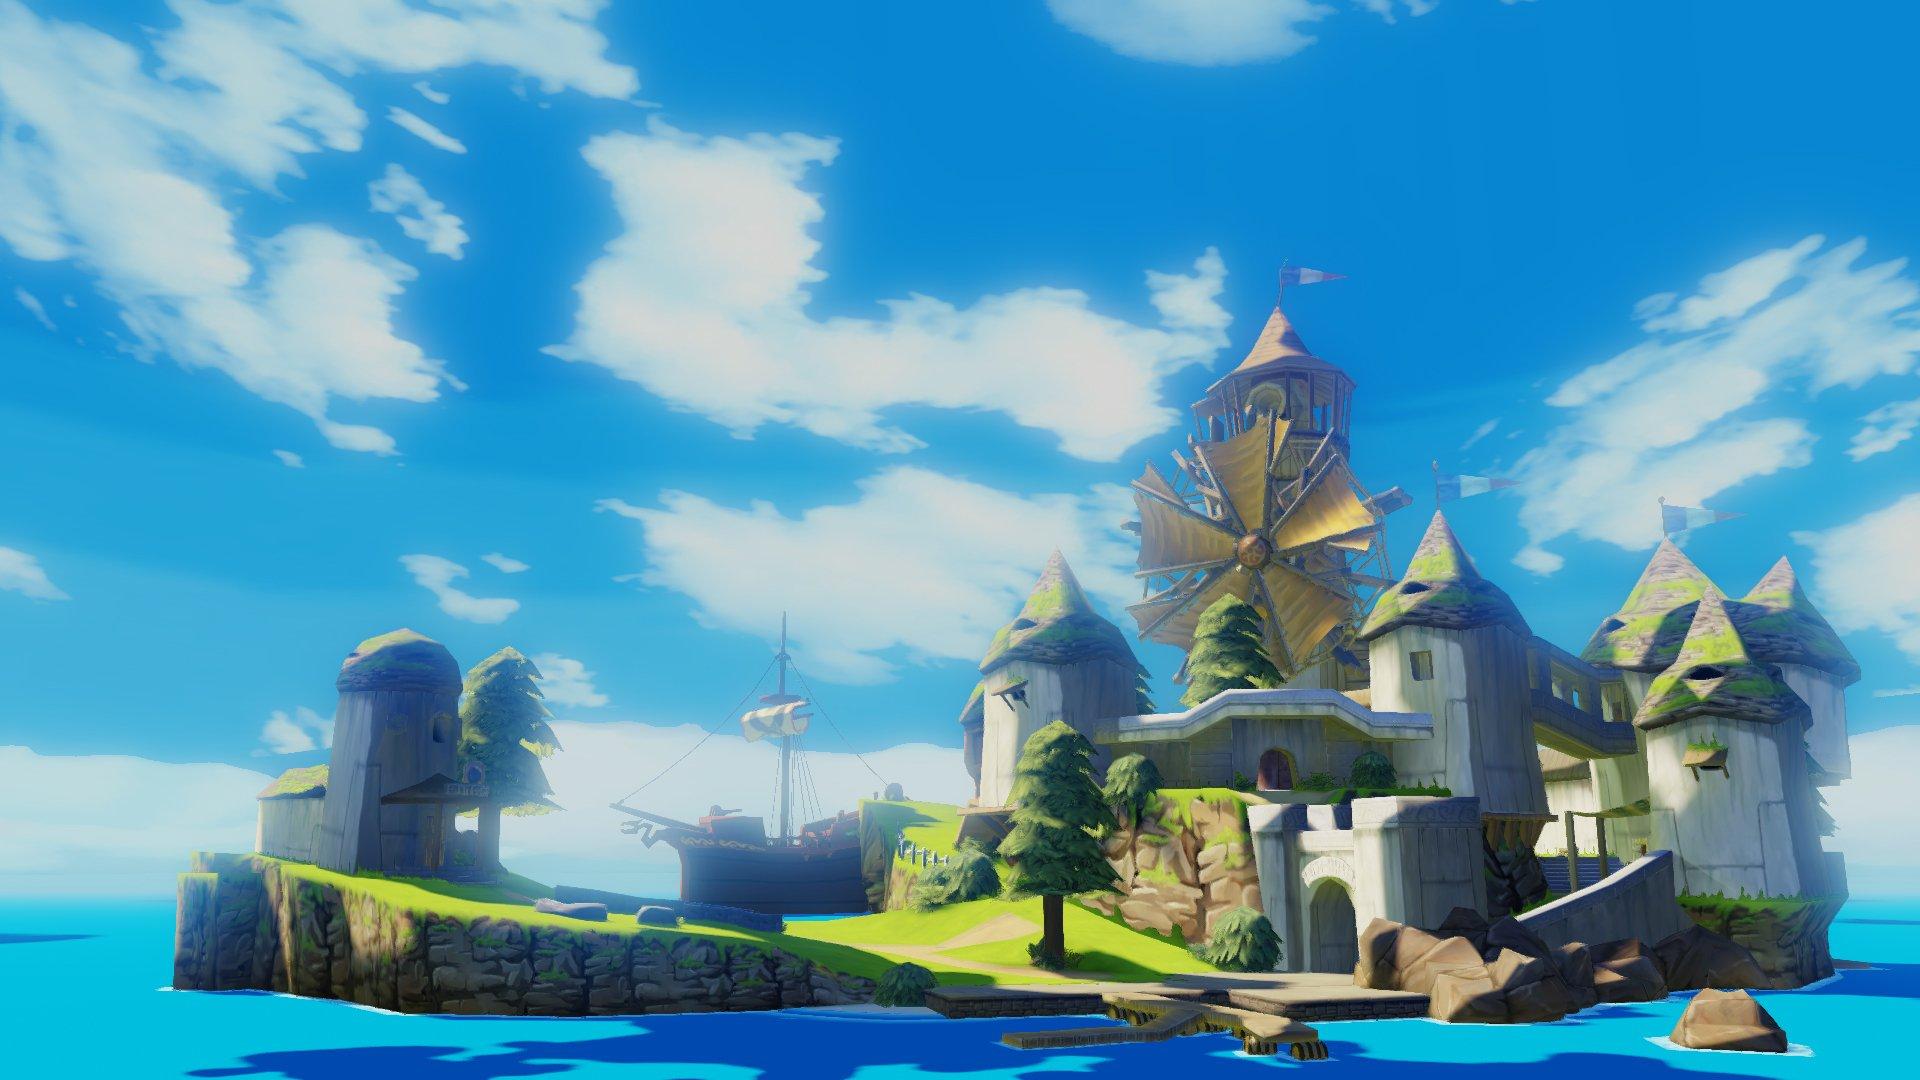 The Legend Of Zelda The Wind Waker Hd Fondo De Pantalla Hd